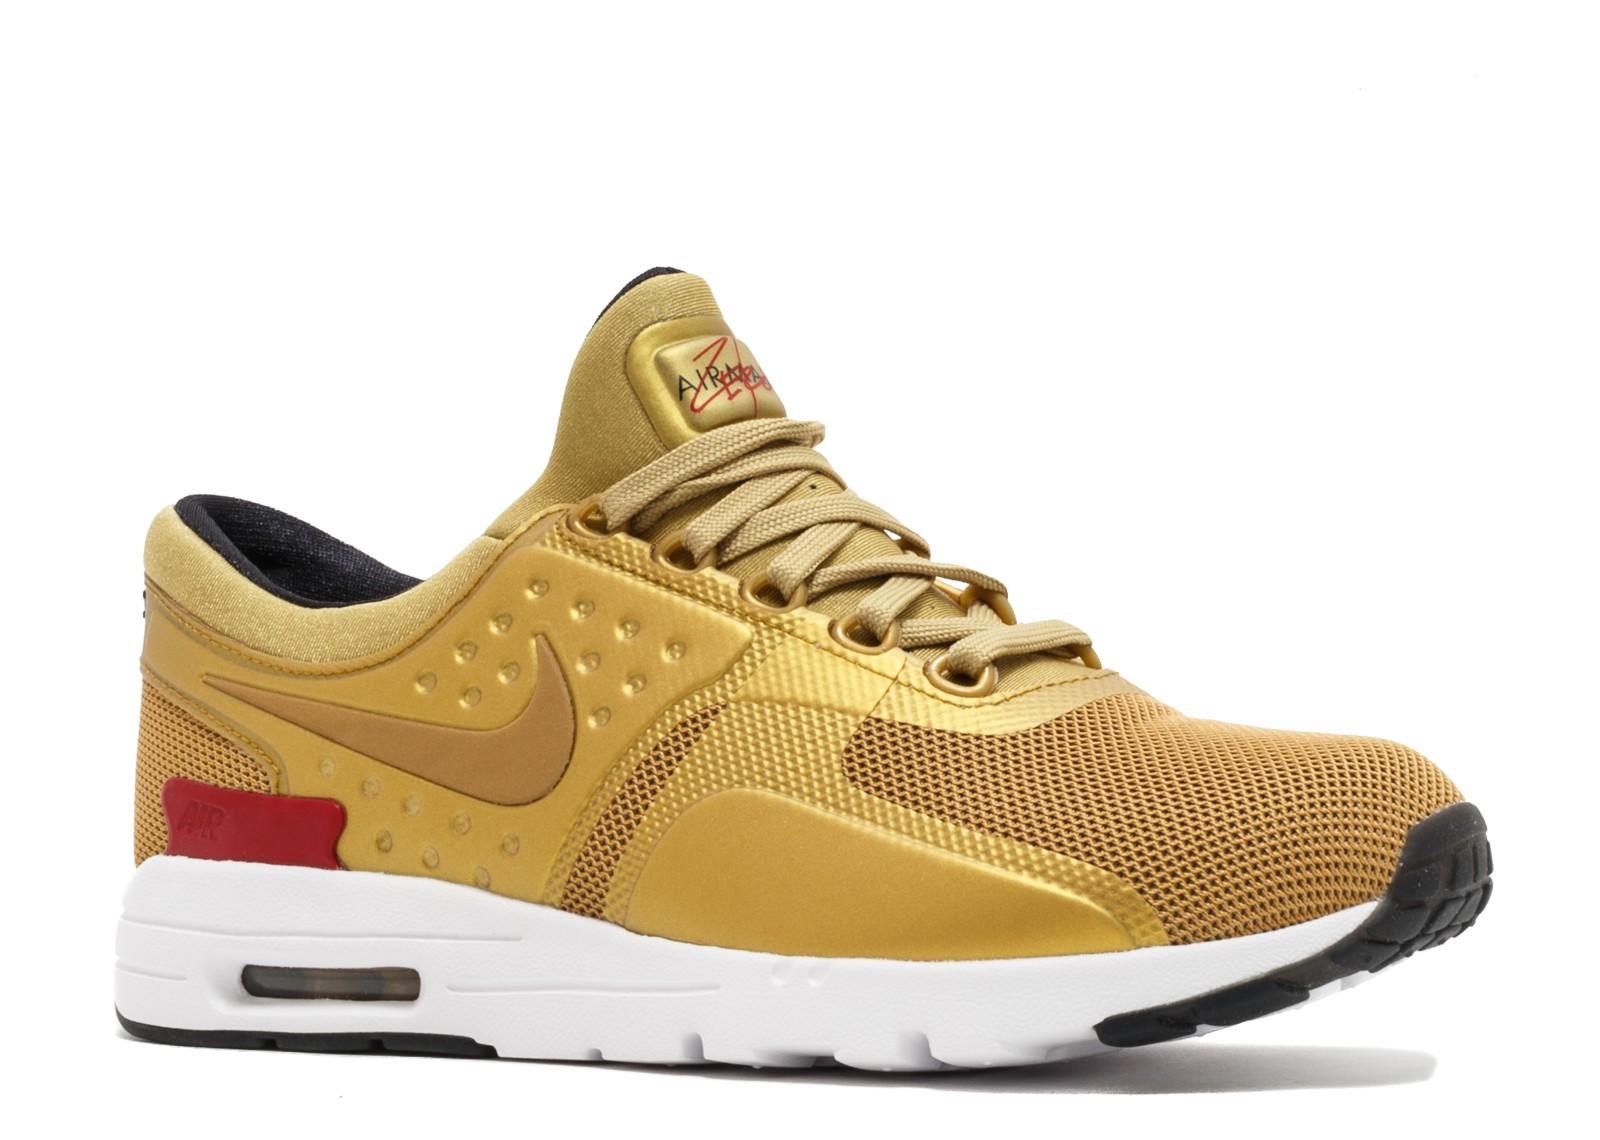 Nike - Nike Womens Air Max Zero Qs Metallic Gold